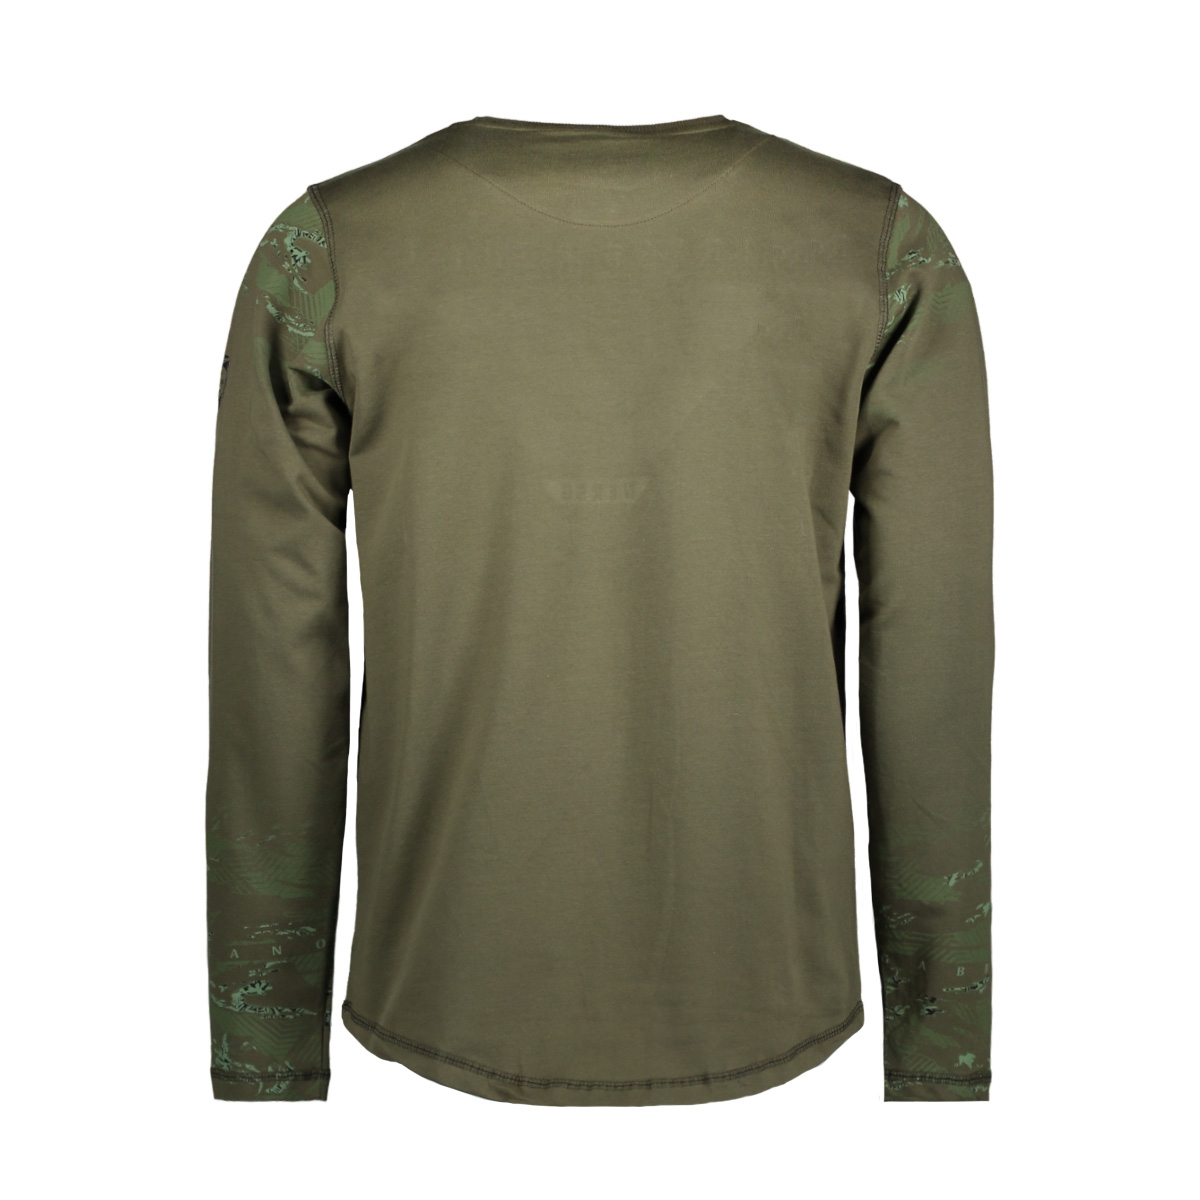 76139 gabbiano t-shirt army